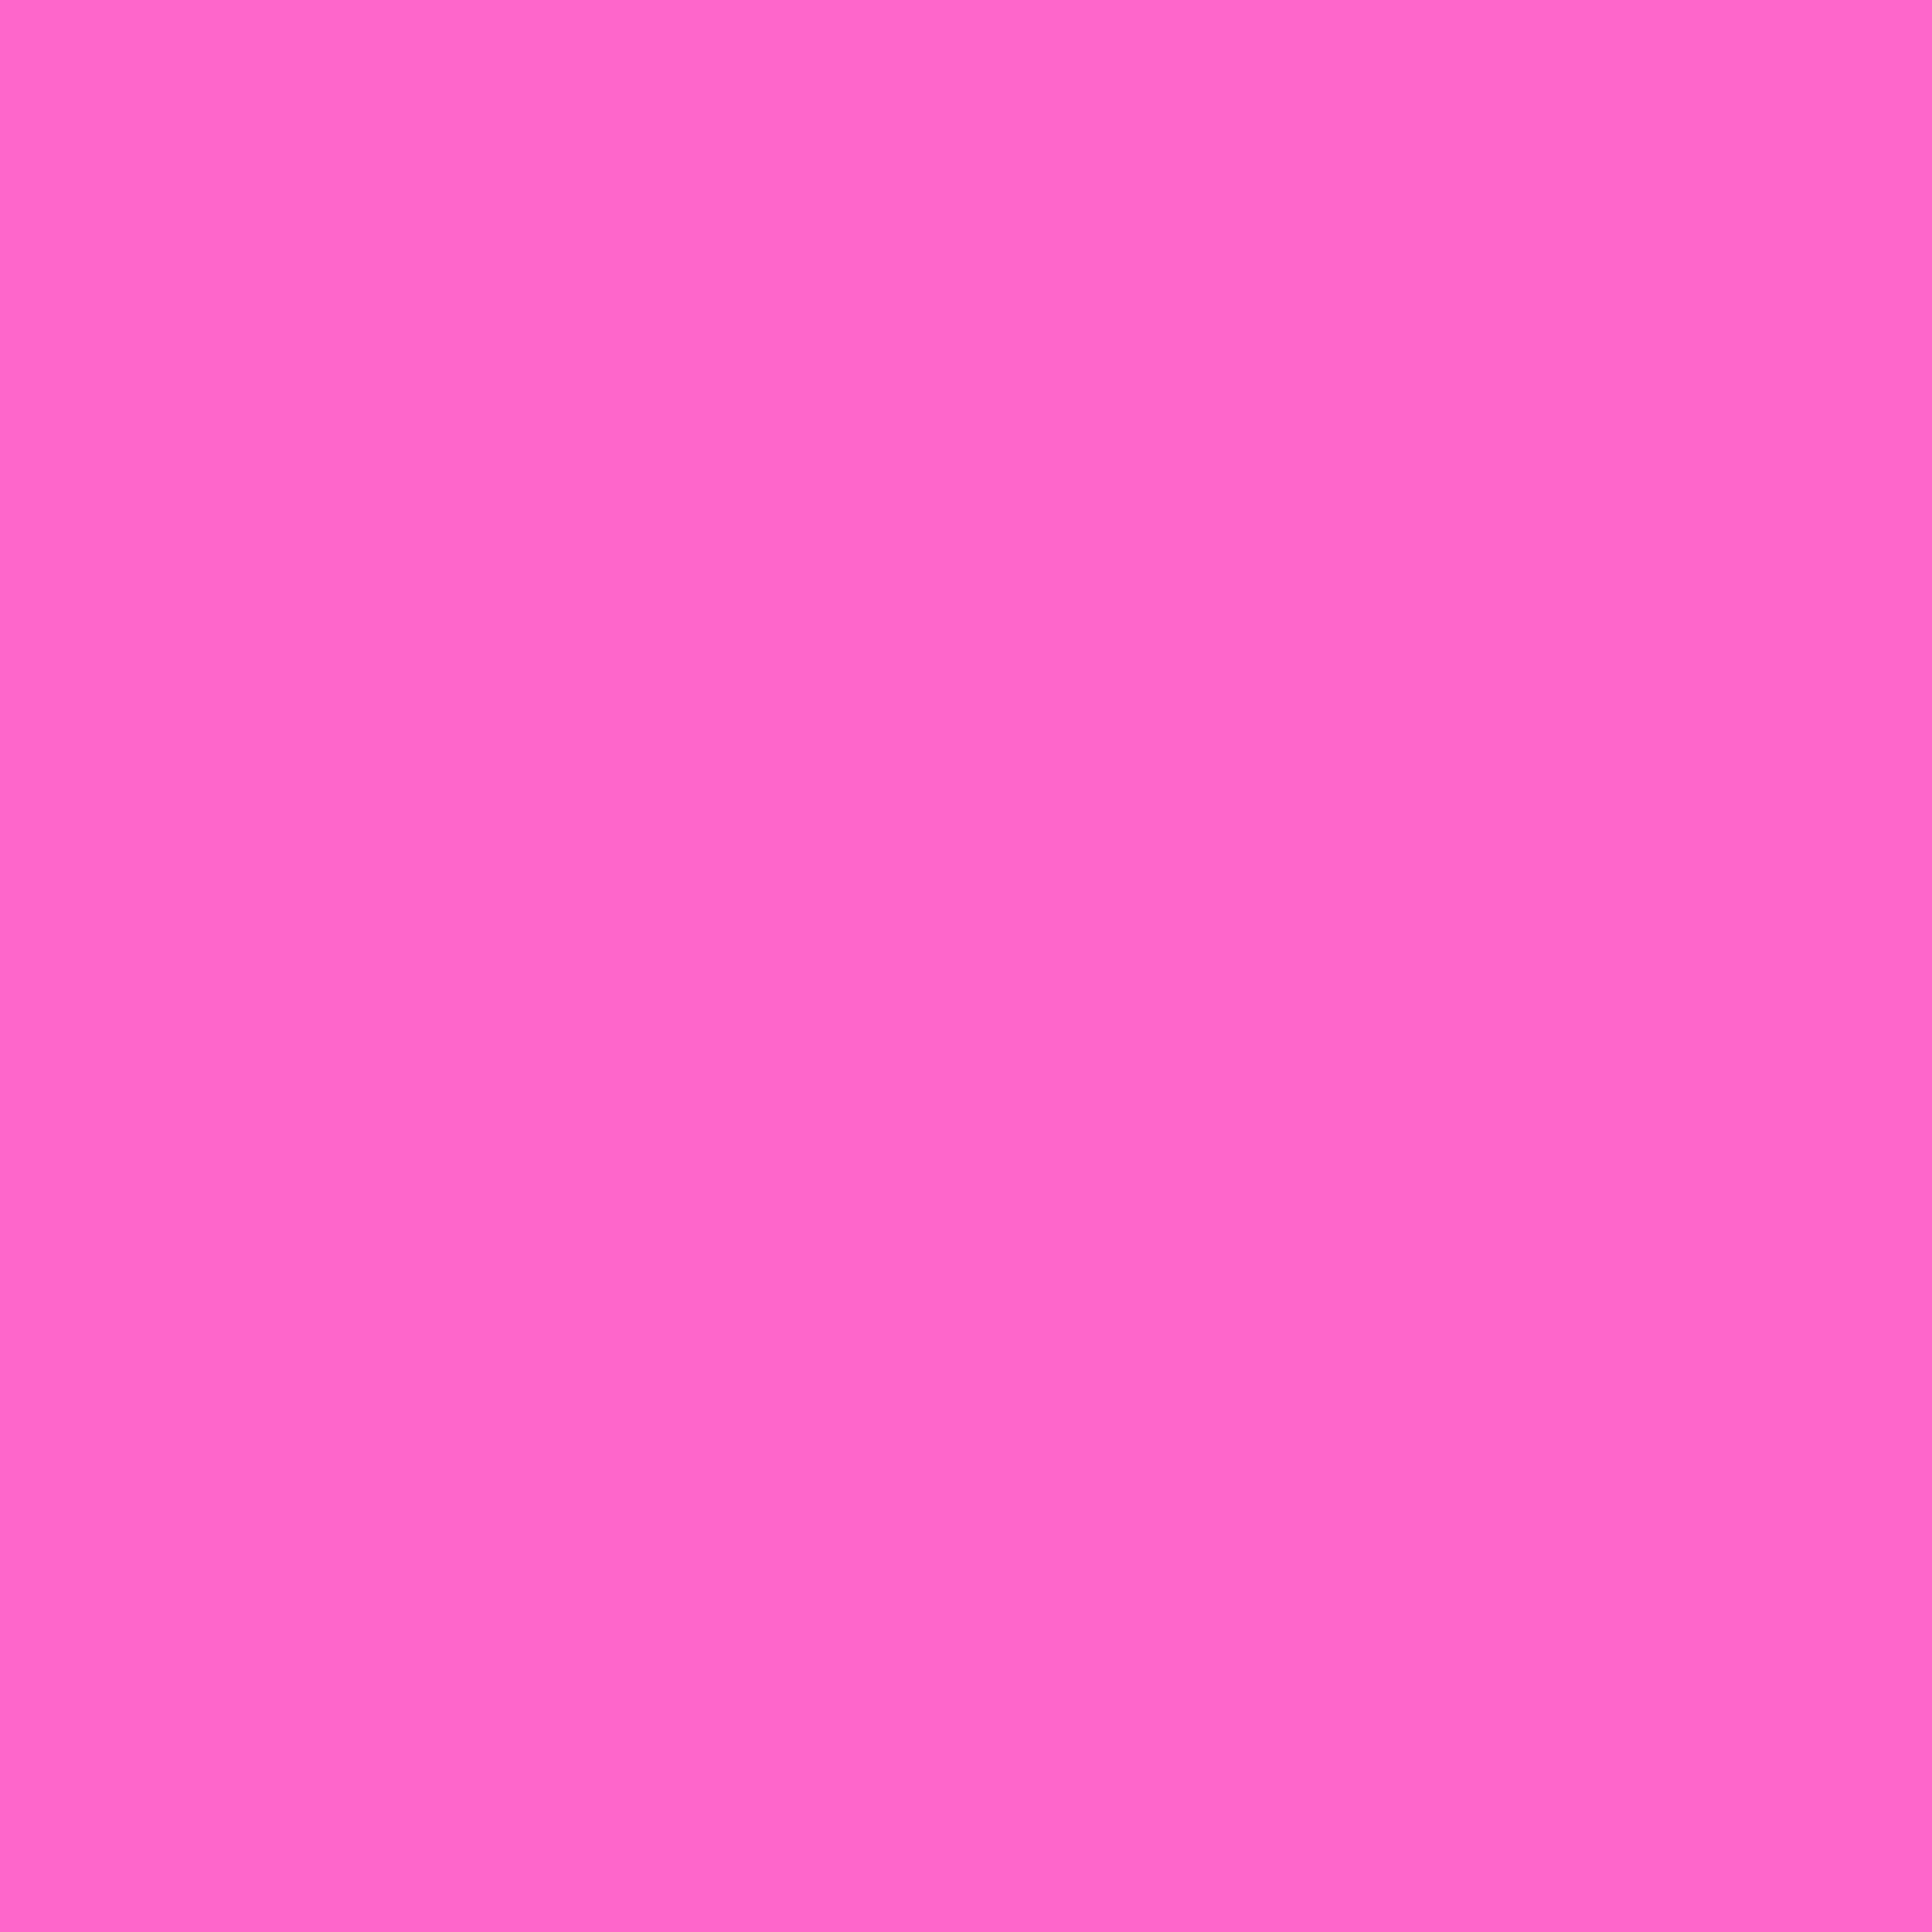 2732x2732 Rose Pink Solid Color Background